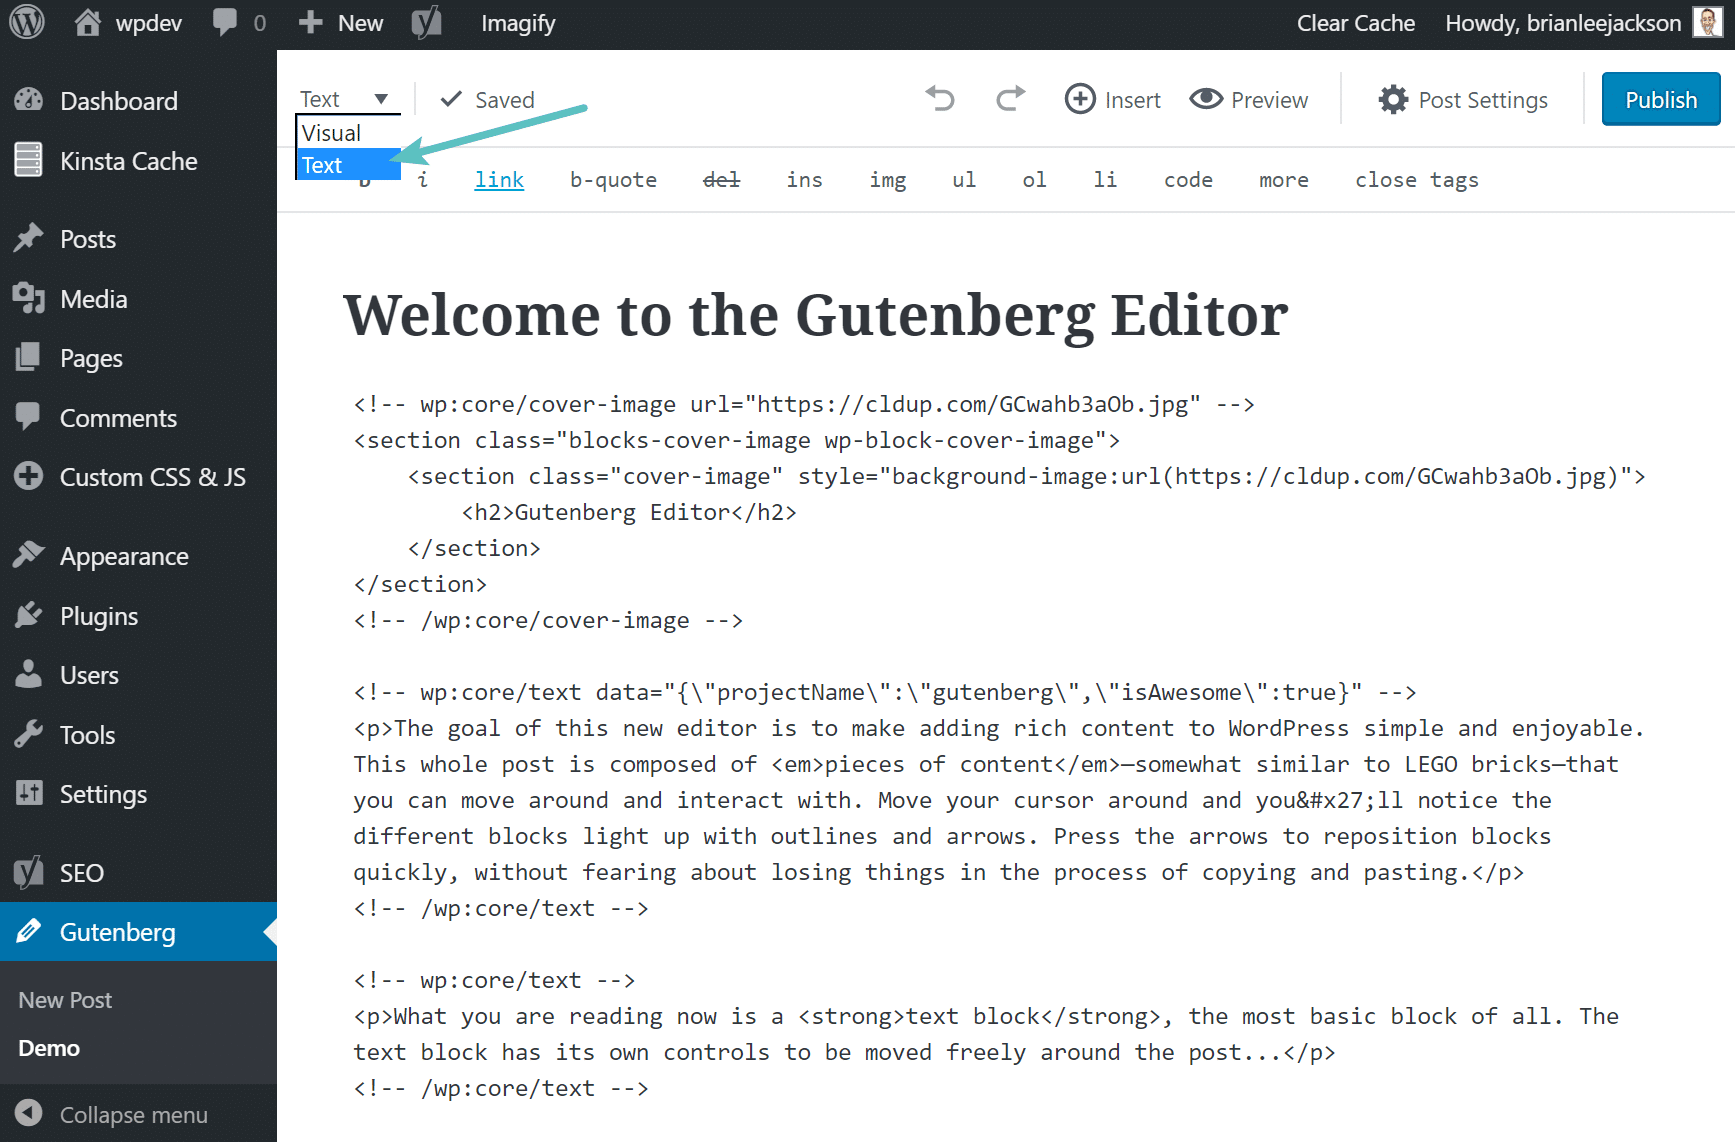 C:\Users\-_Antonio_-\Downloads\Editor-de-texto-de-Gutenberg.png